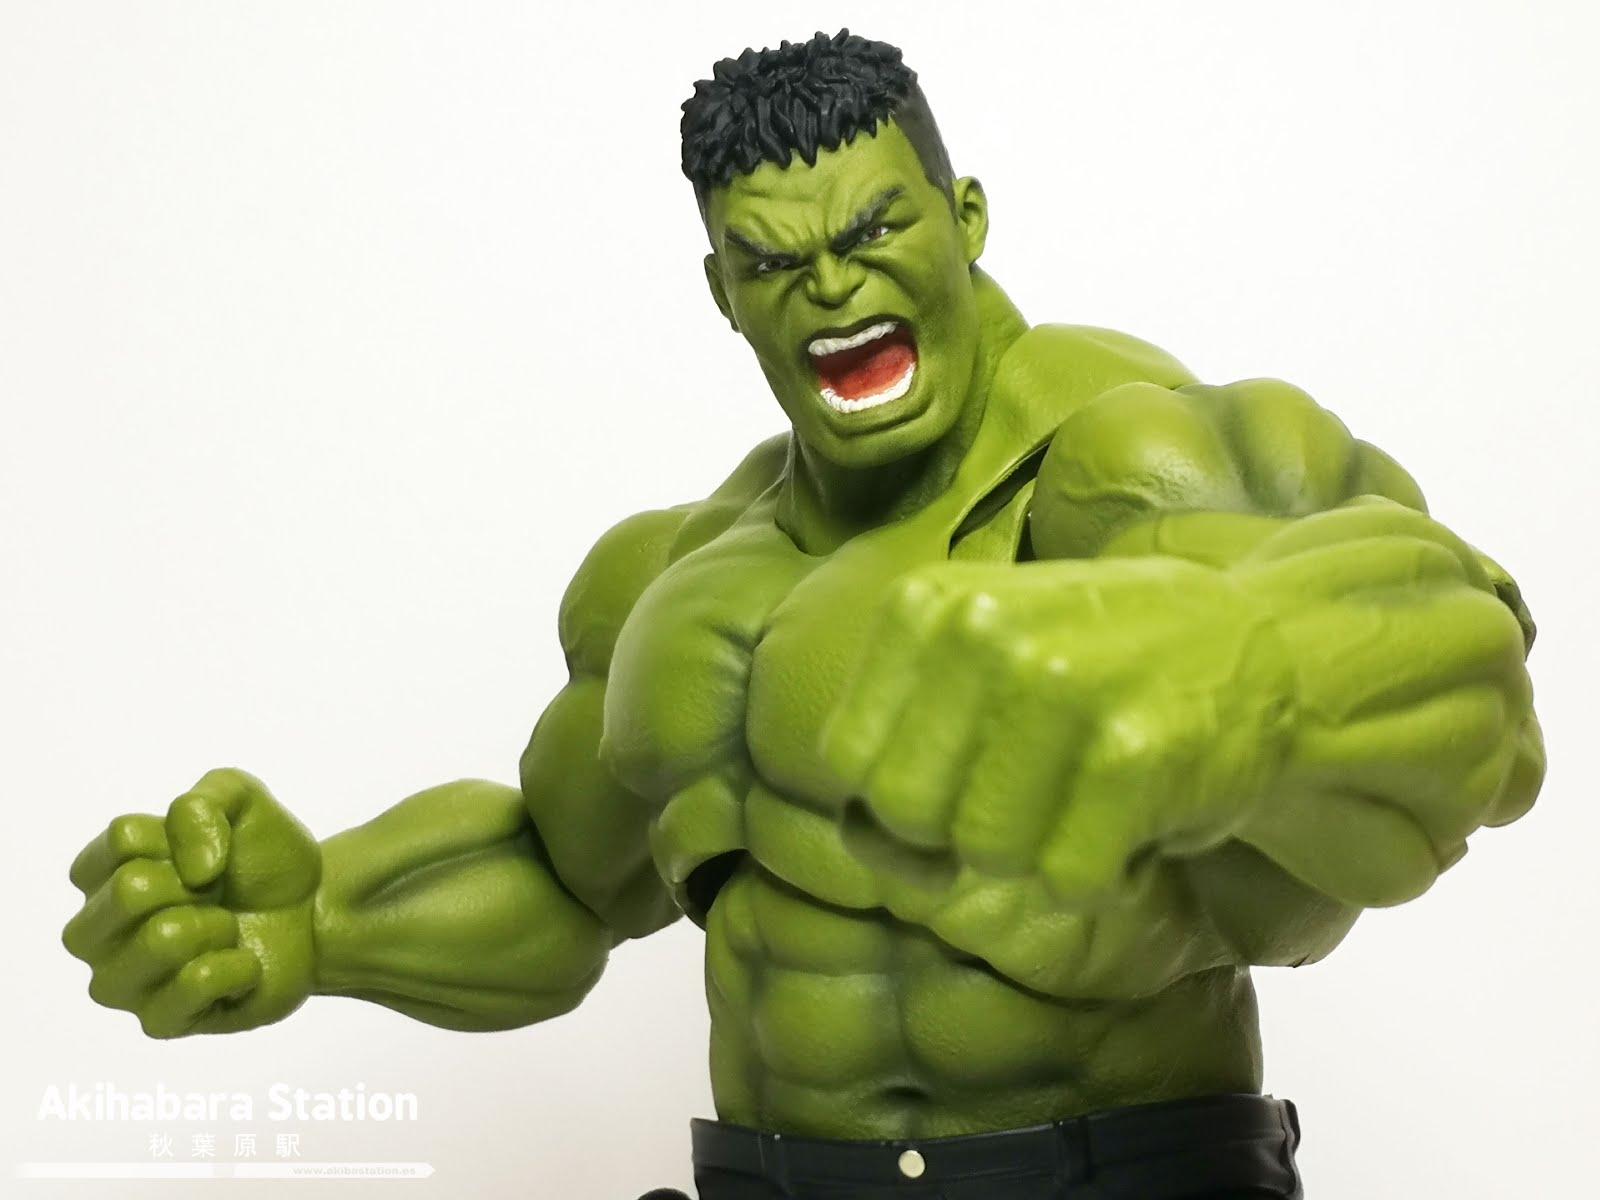 Review del S.H.Figuarts Hulk de Avengers: Infinity War - Tamashii Nations